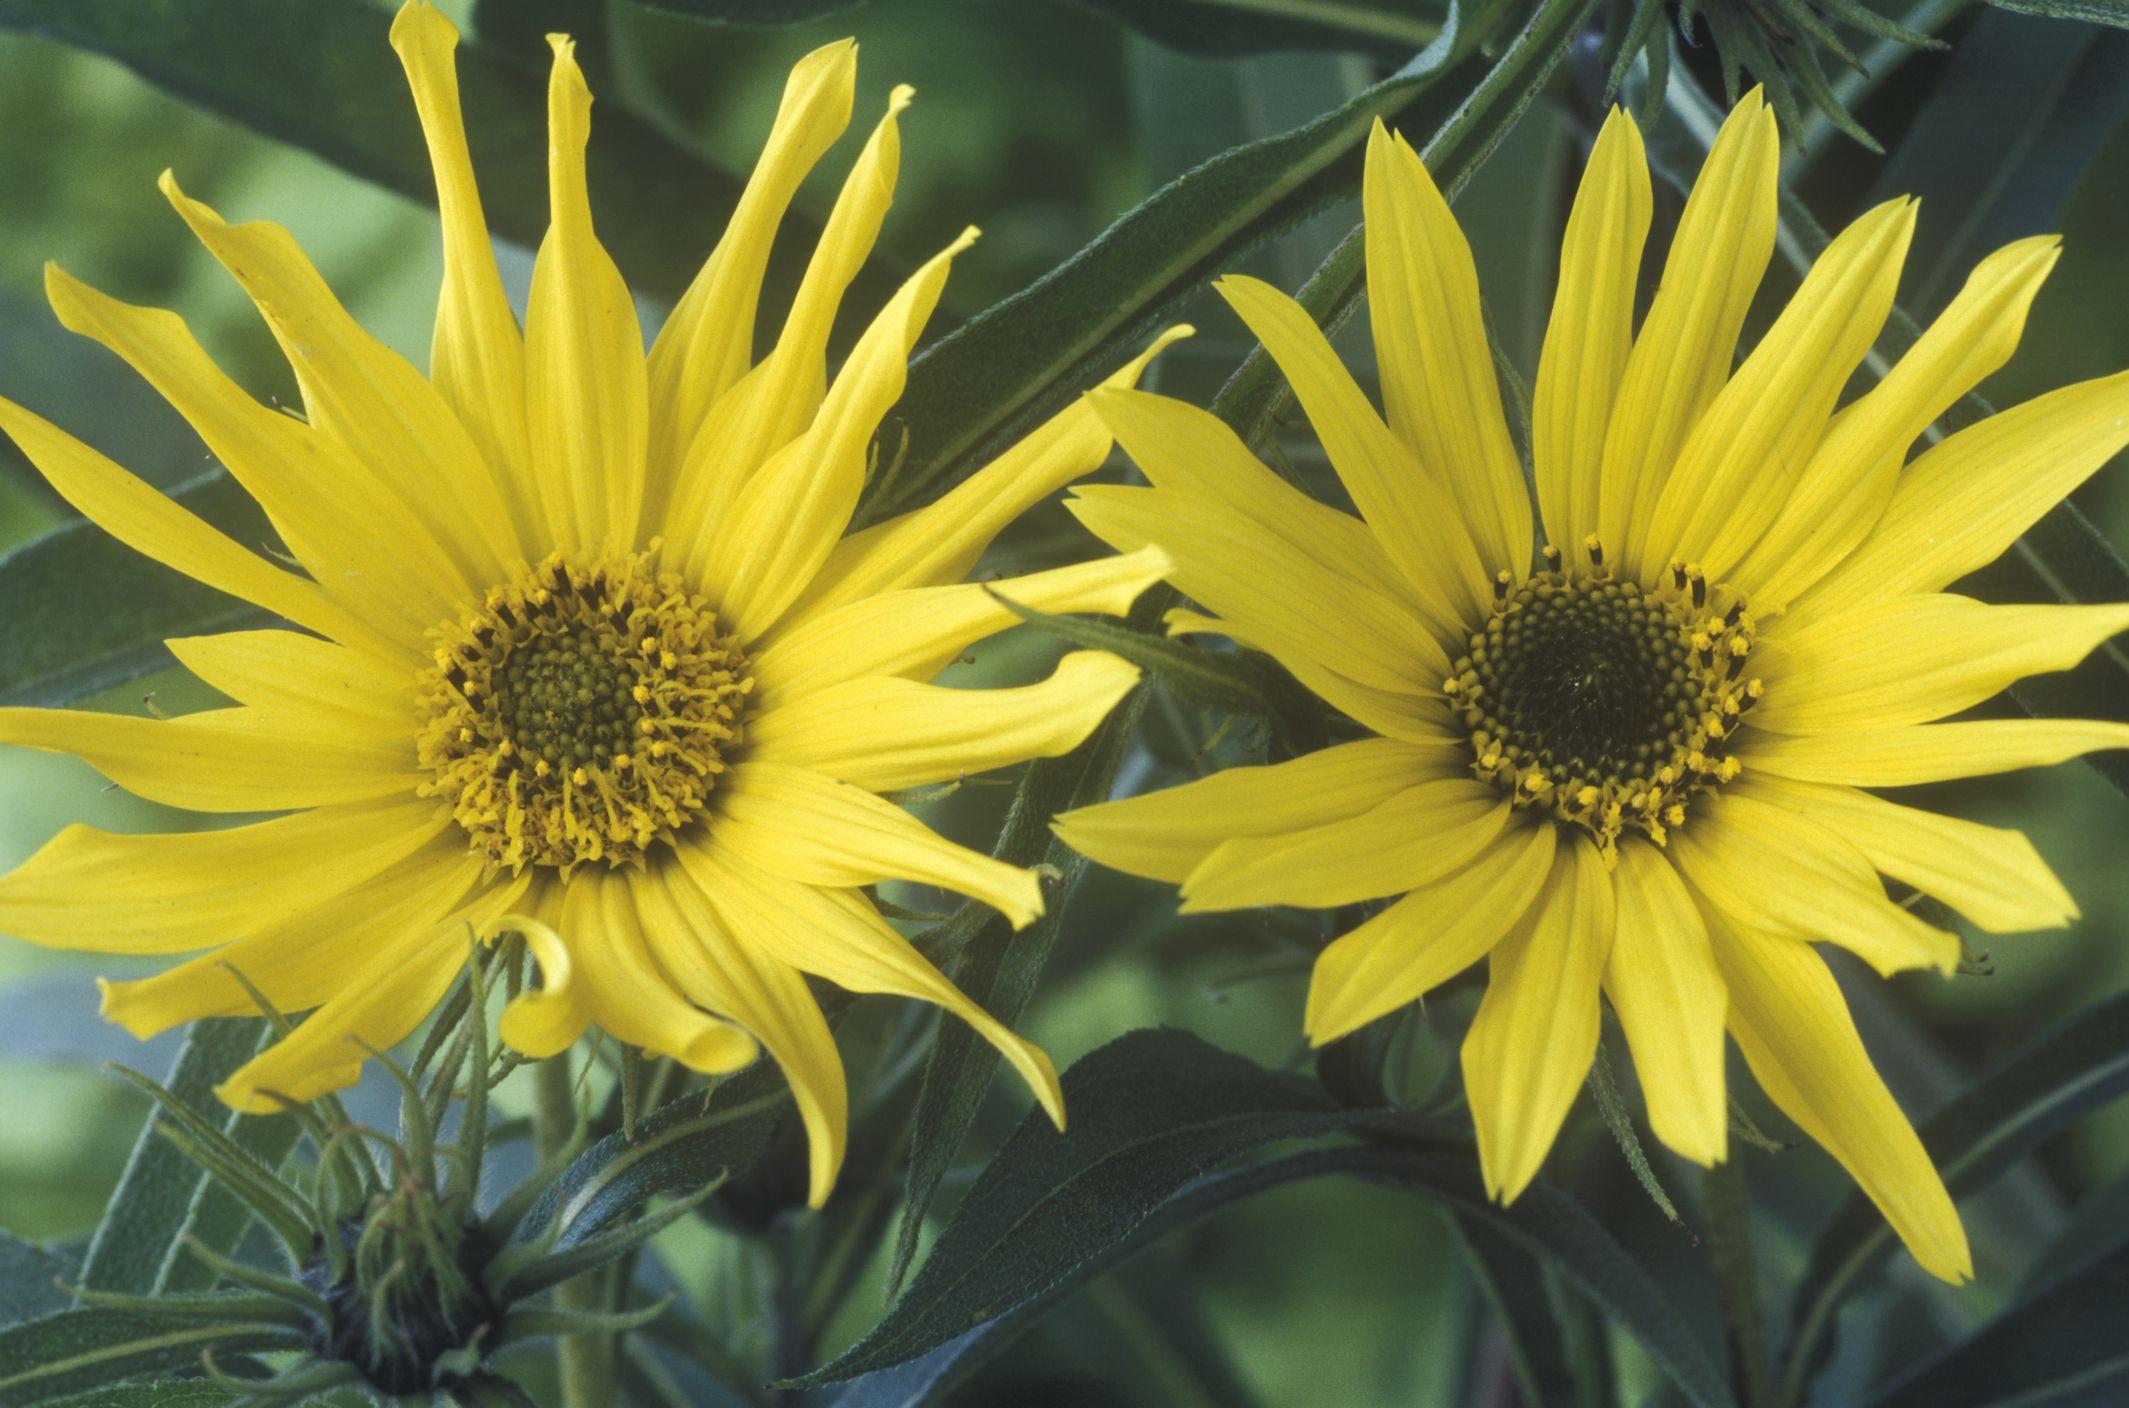 Growing Perennial Sunflowers